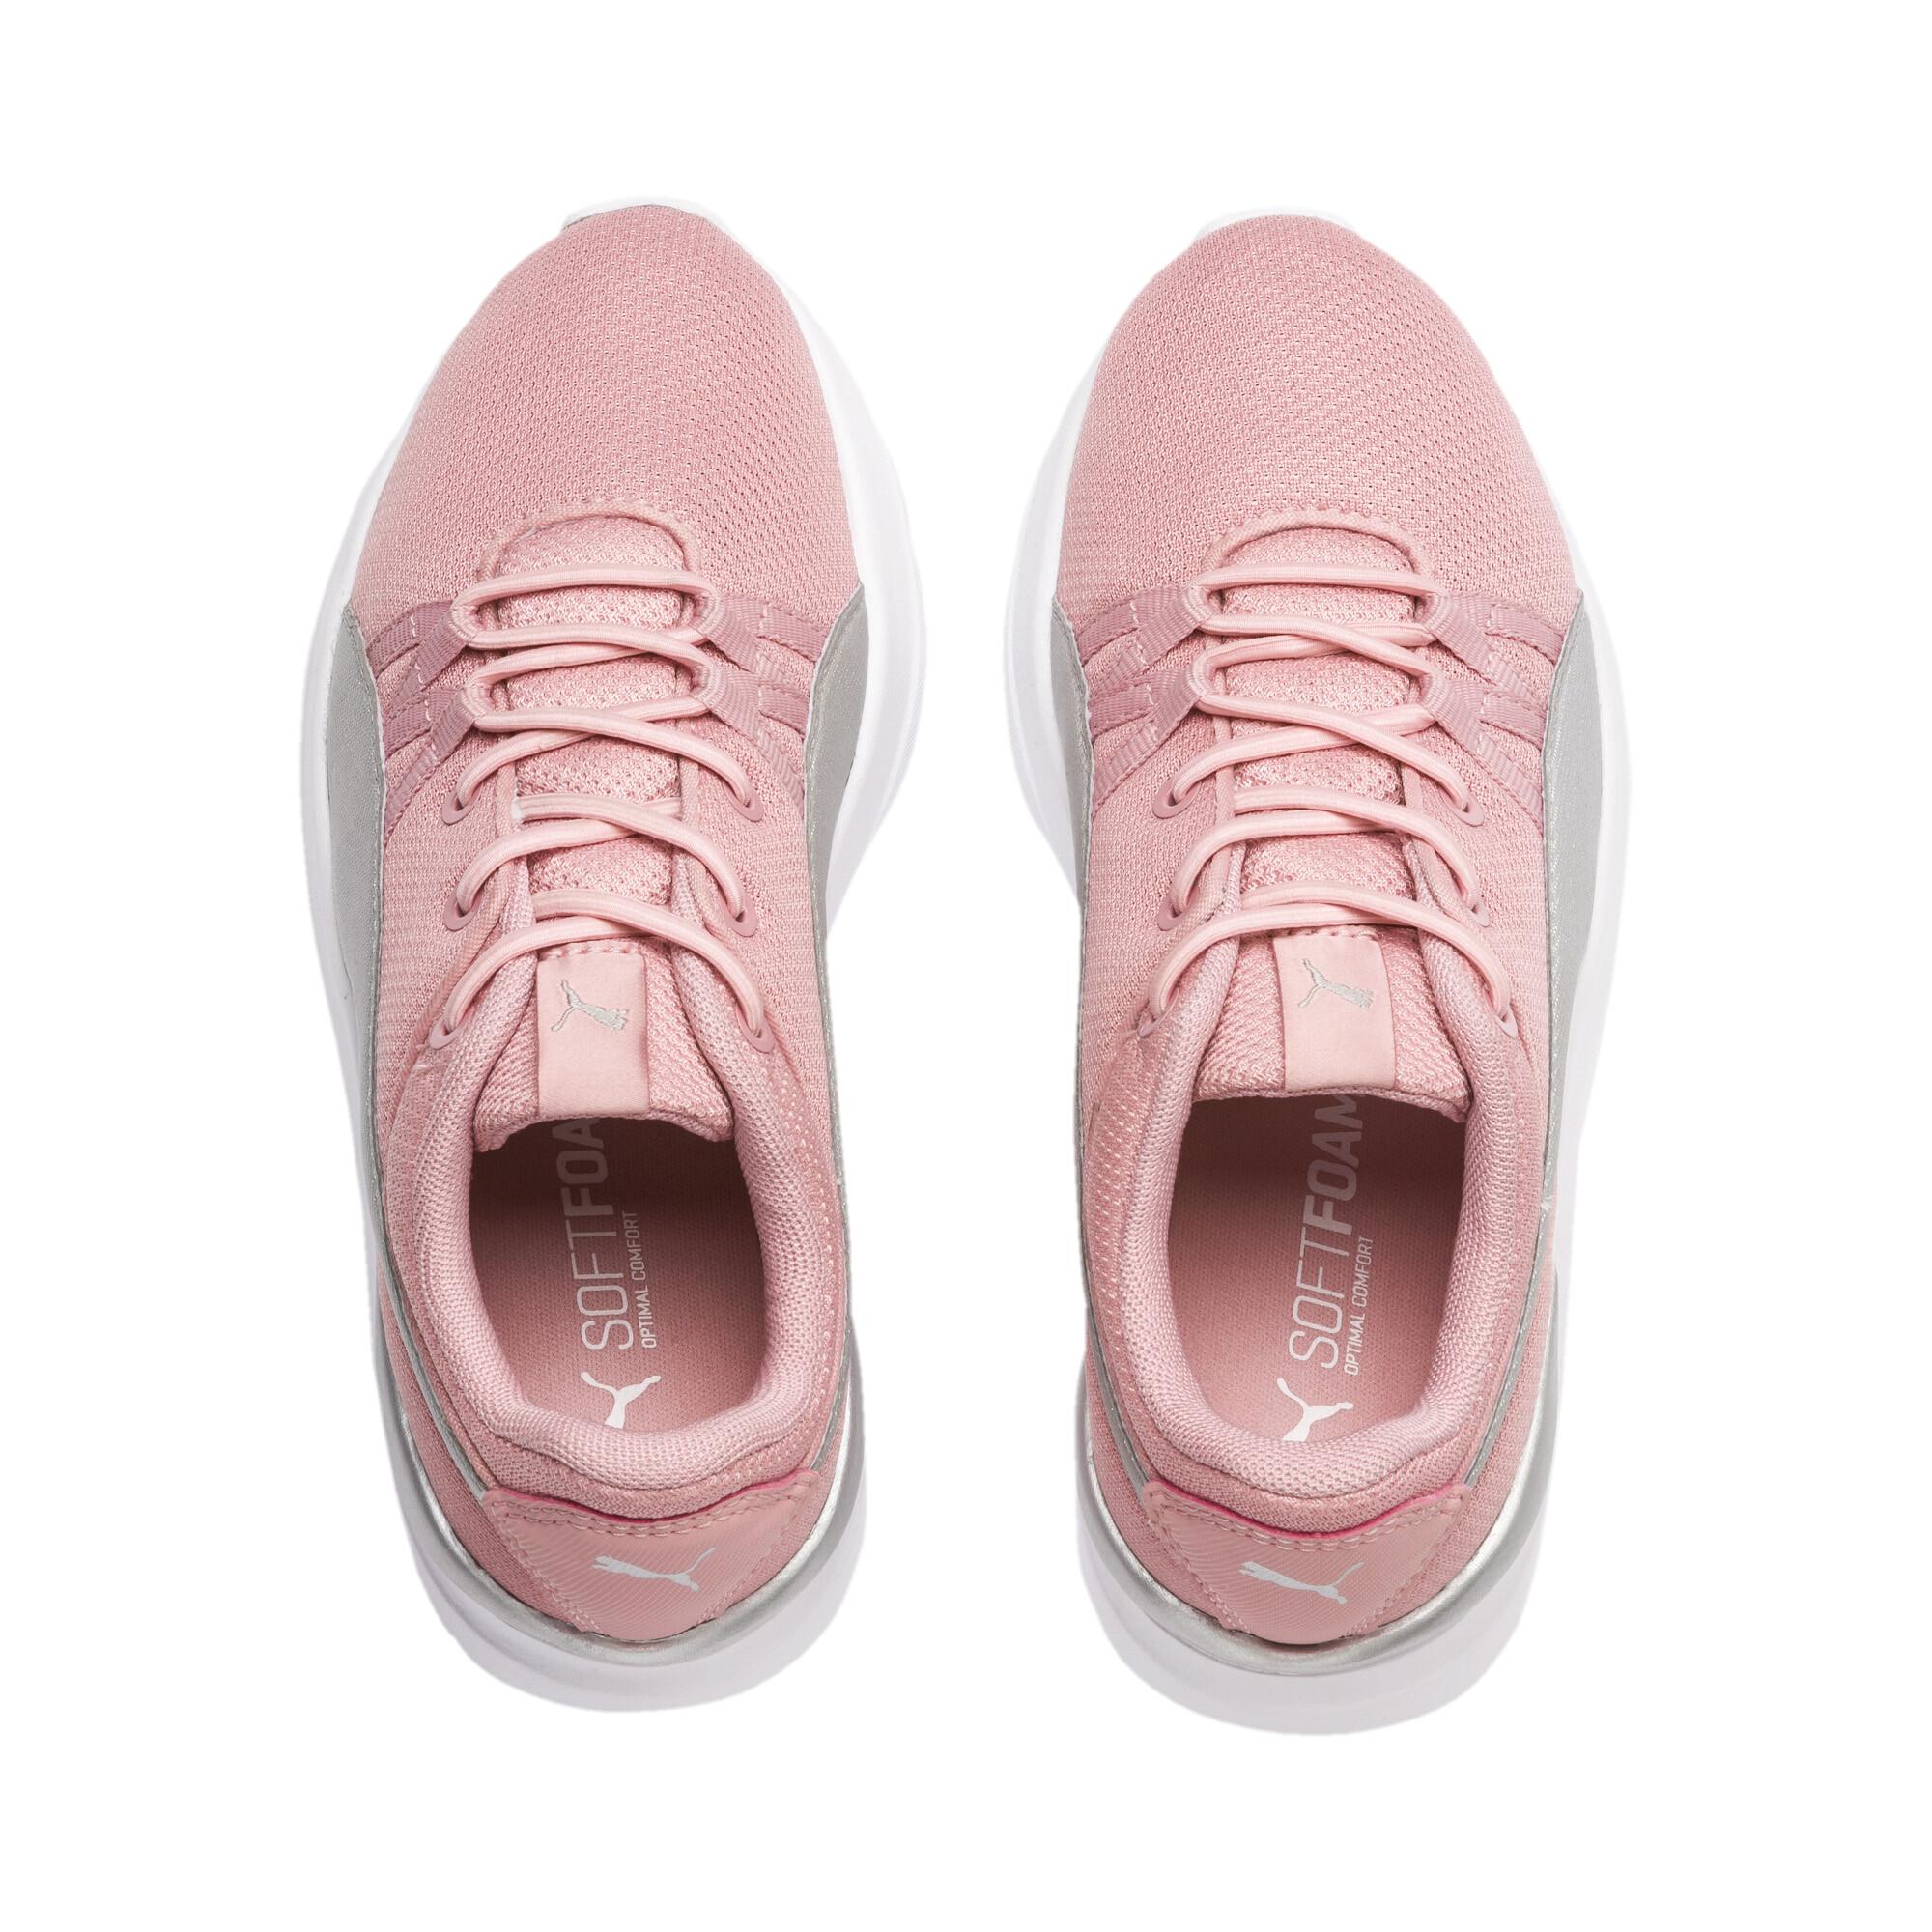 PUMA-Adela-Breathe-AC-Sneakers-PS-Girls-Shoe-Kids thumbnail 13